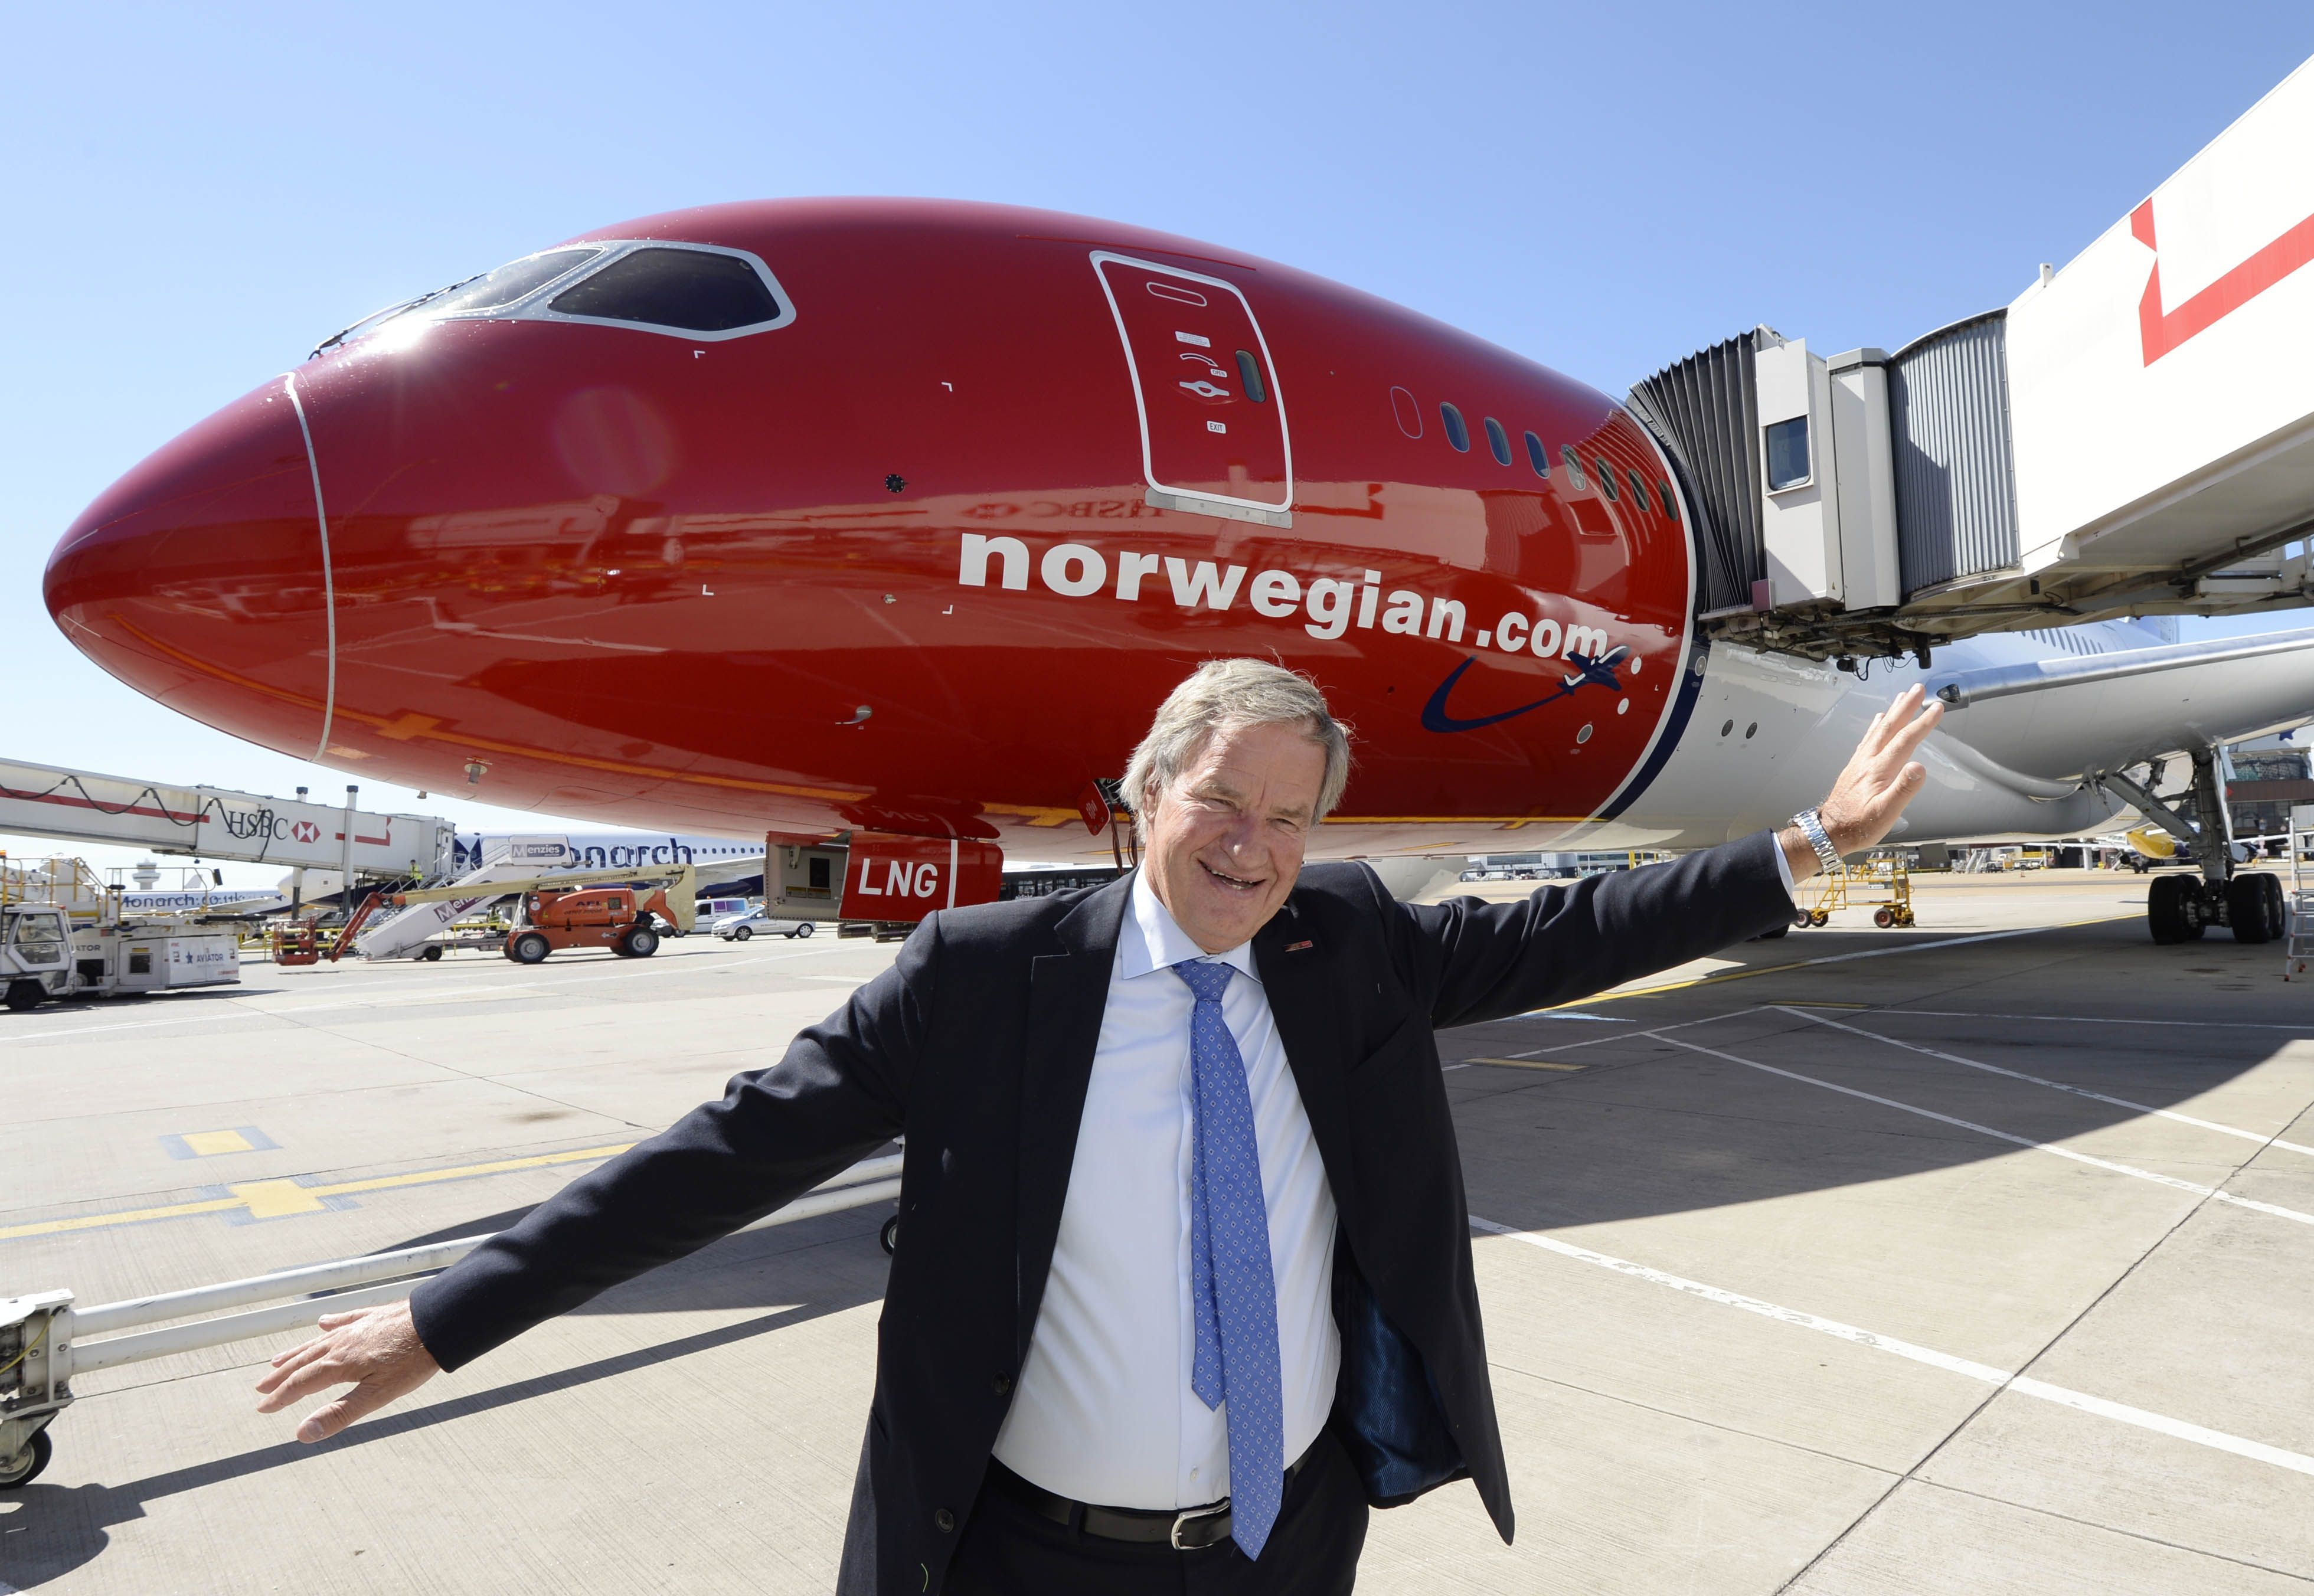 Norwegian Air Shuttle has announced that it will offer